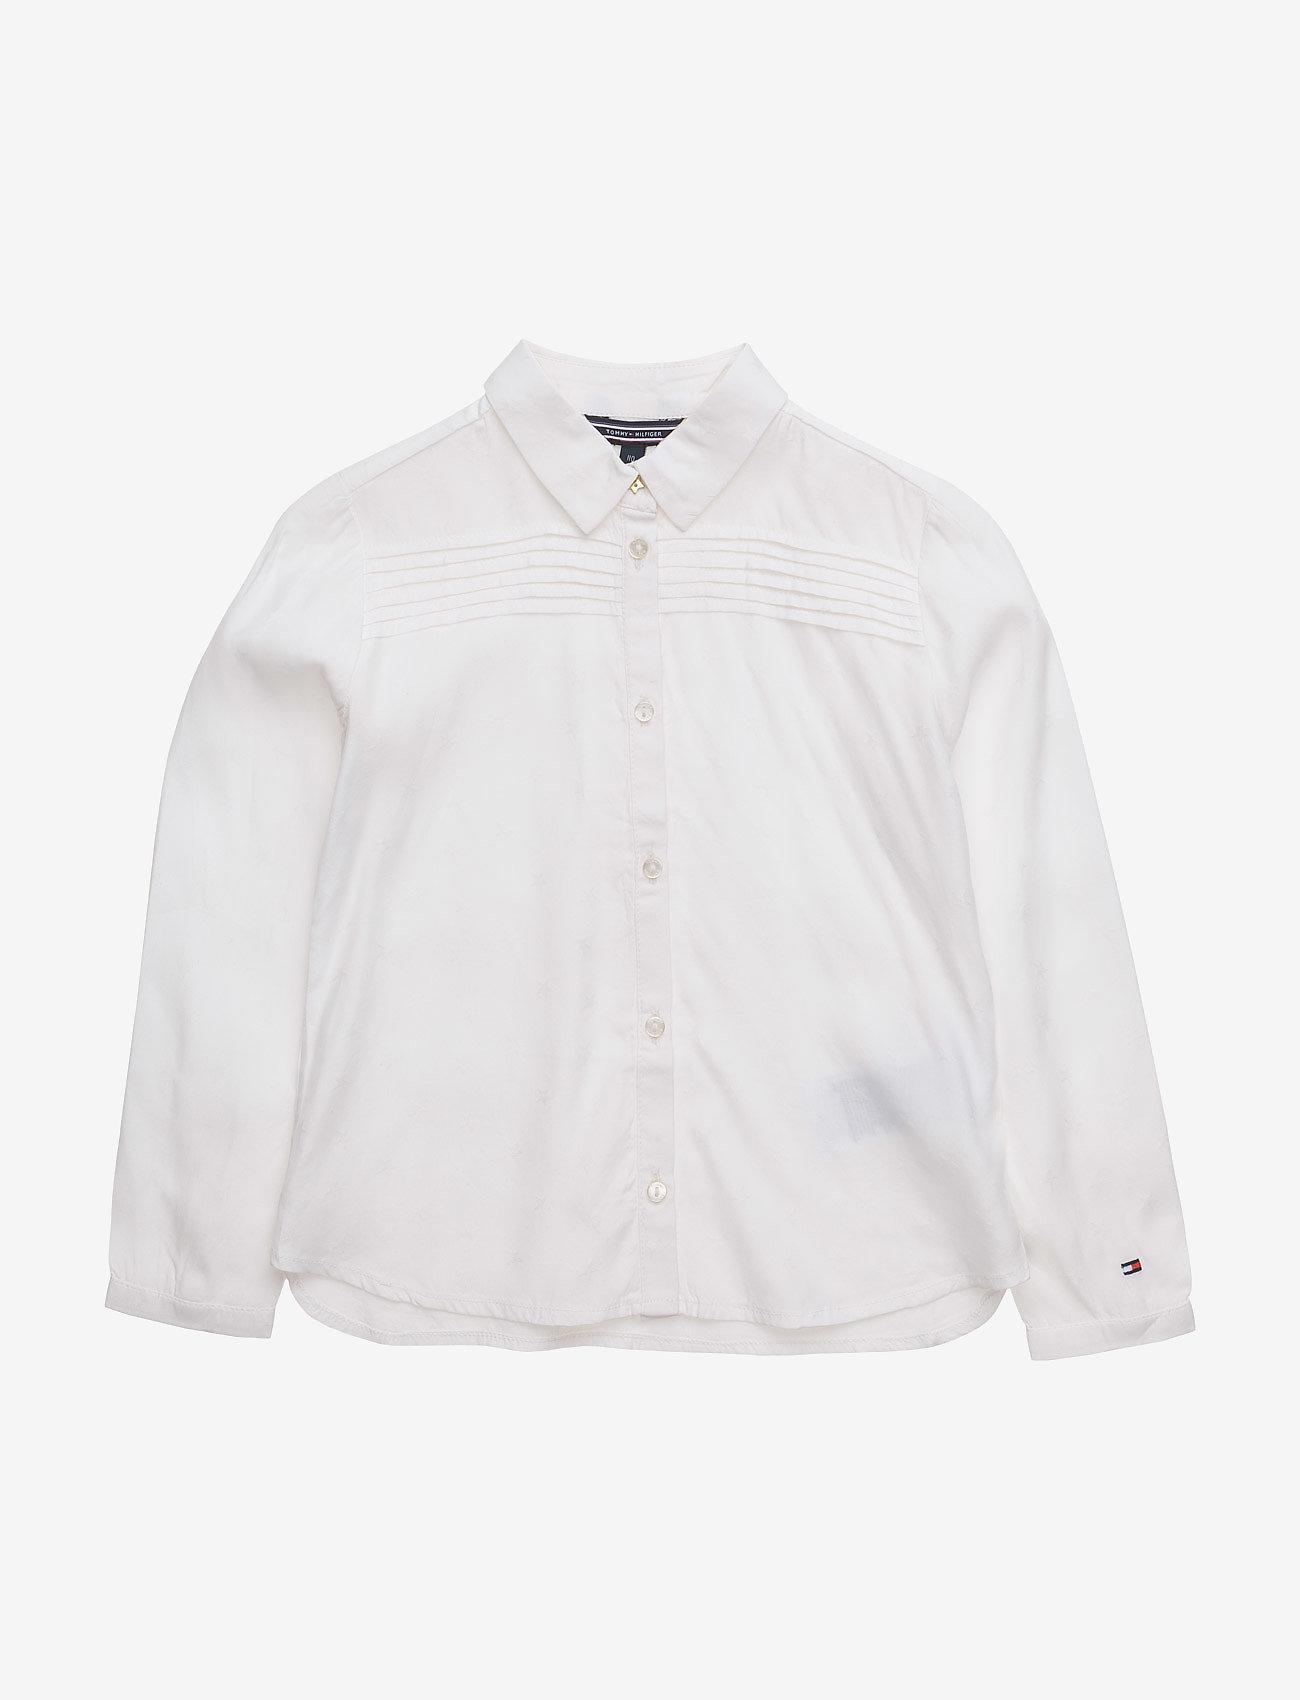 Tommy Hilfiger - STAR JACQUARD MINI TOP  L/S - shirts - white - 0